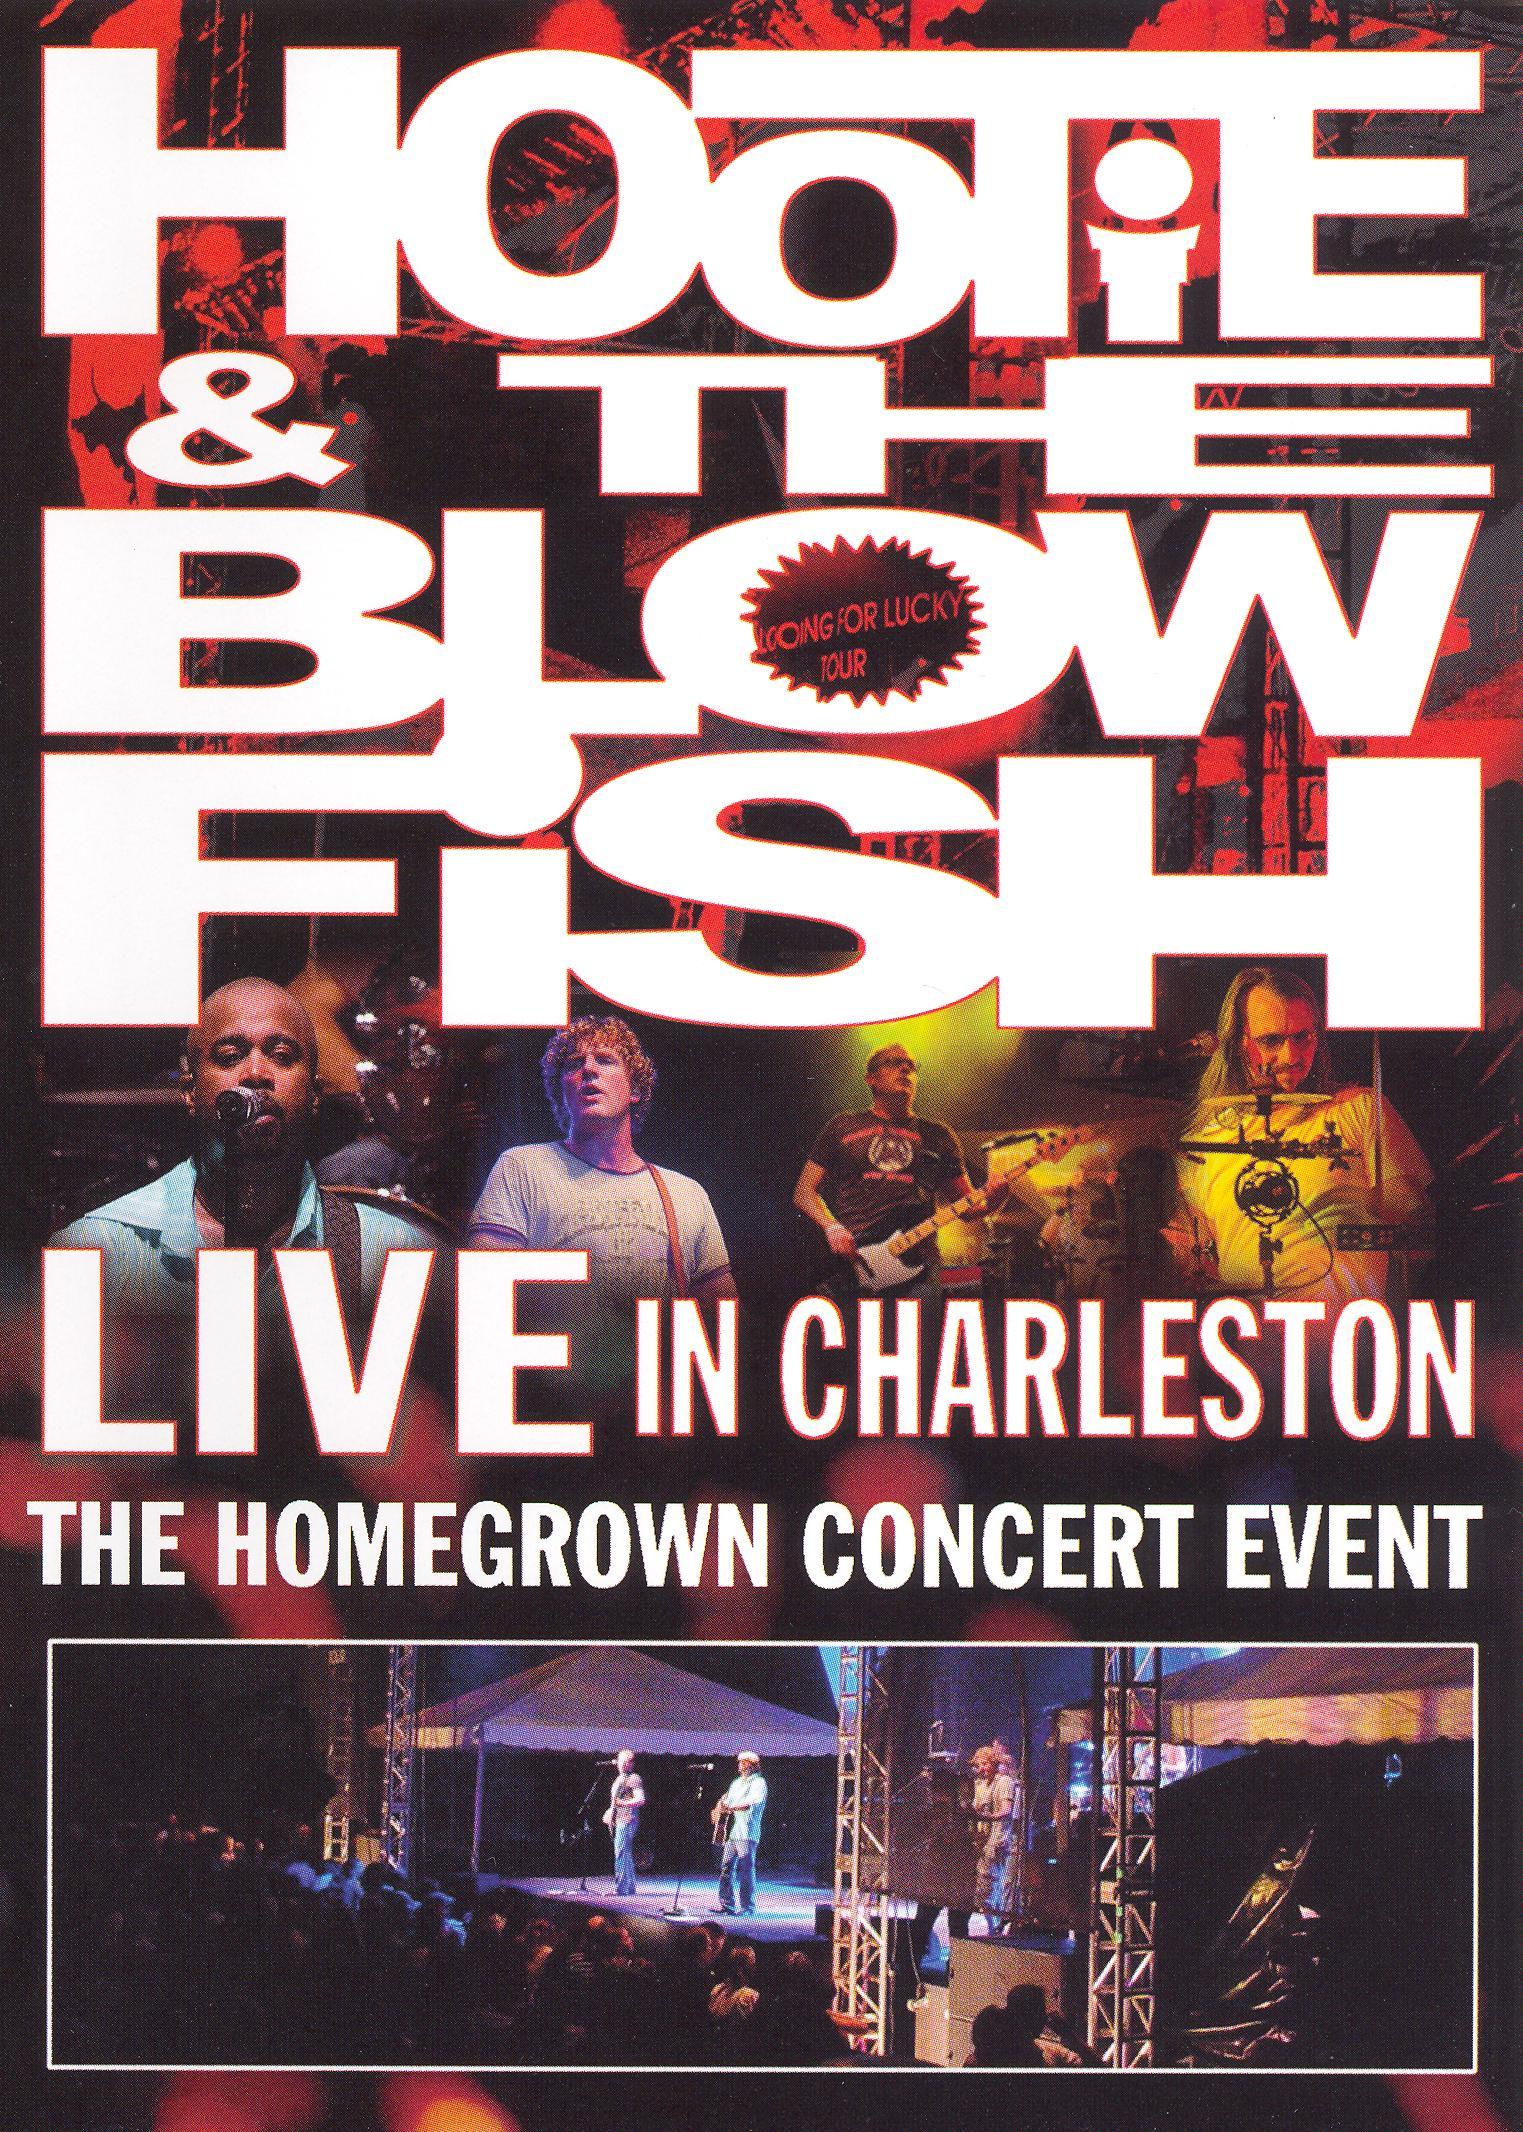 Hootie & The Blowfish: Live in Charleston